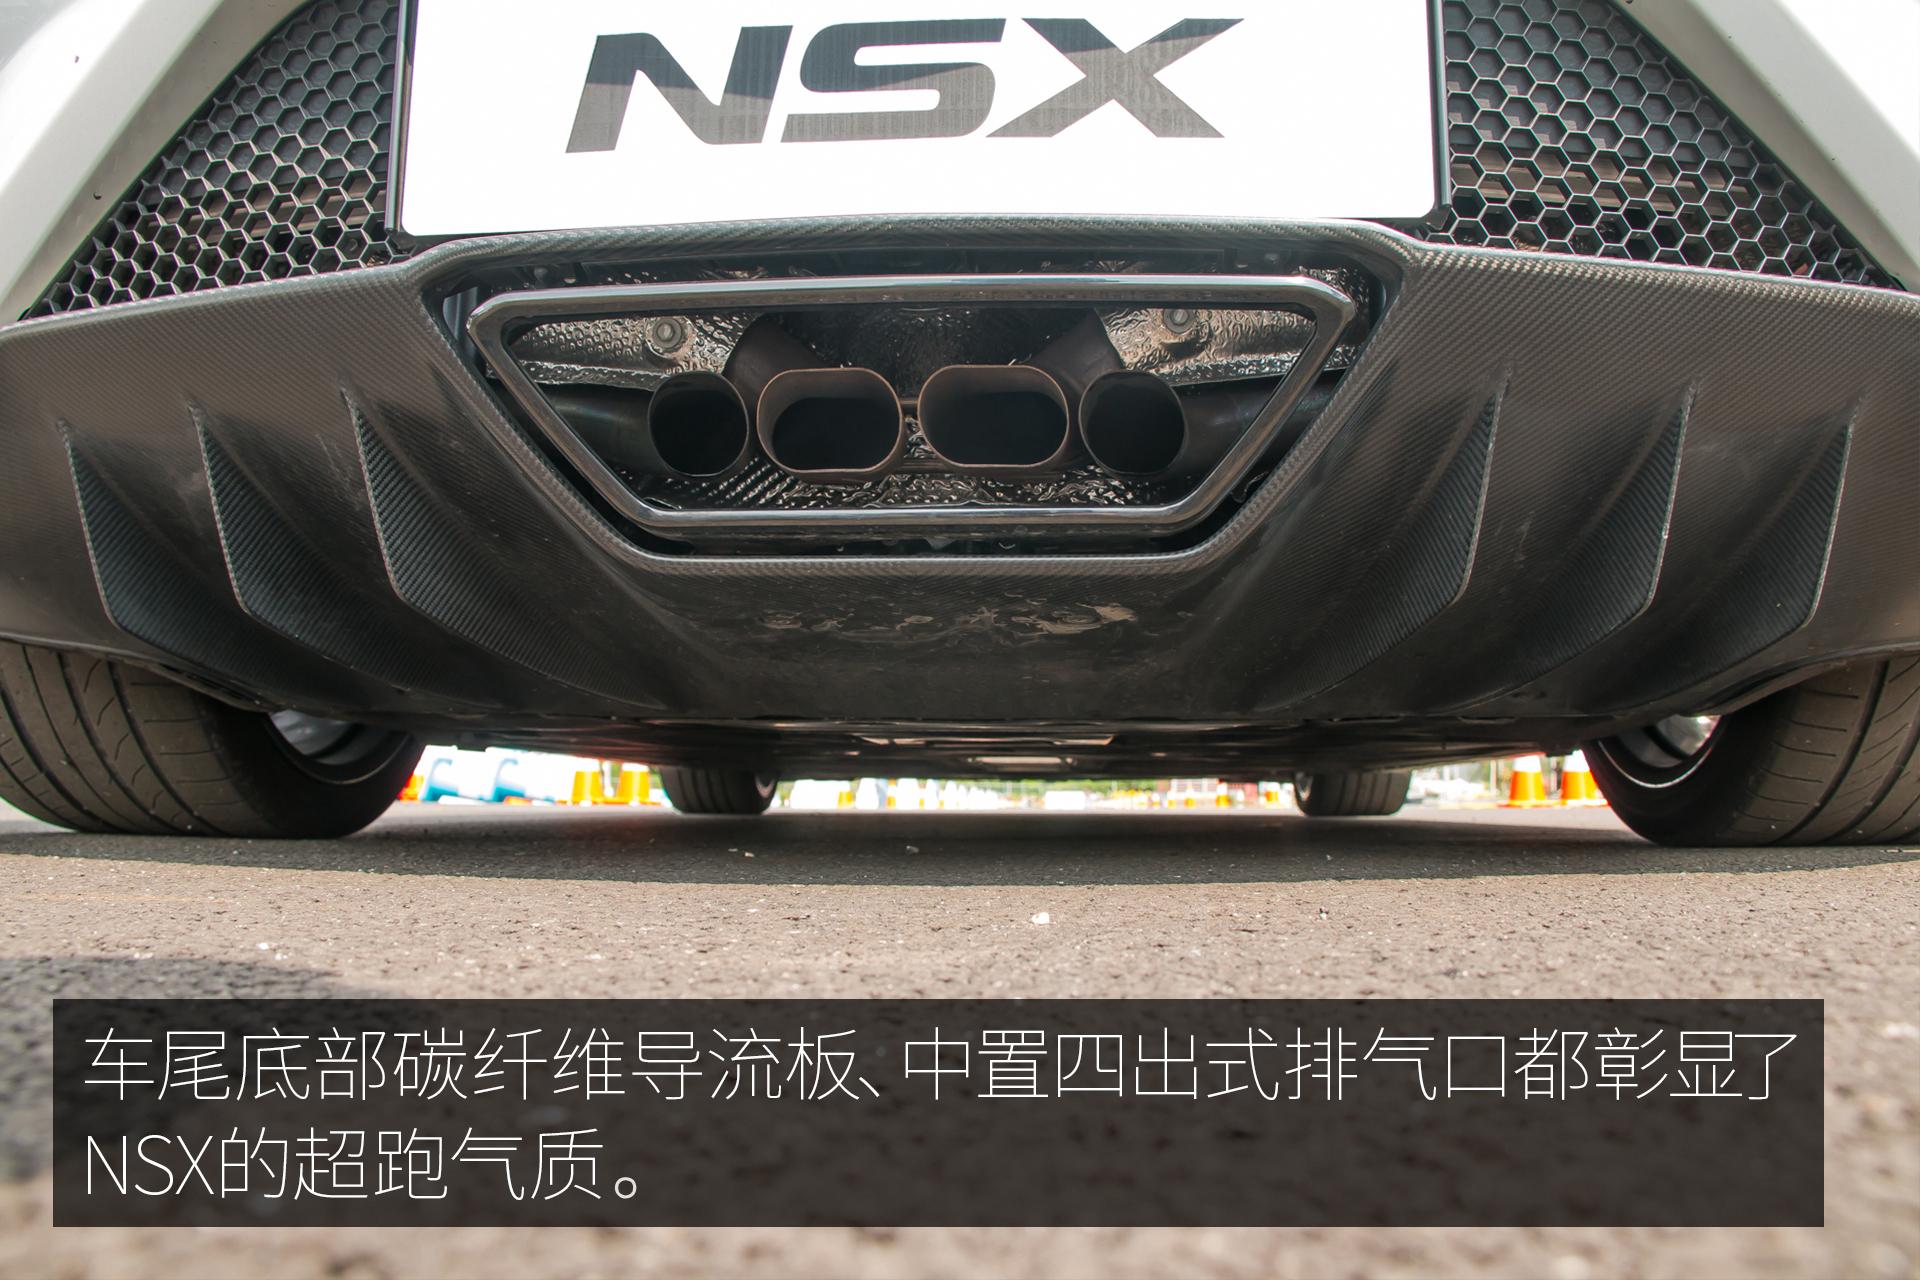 NSX 排气管.jpg